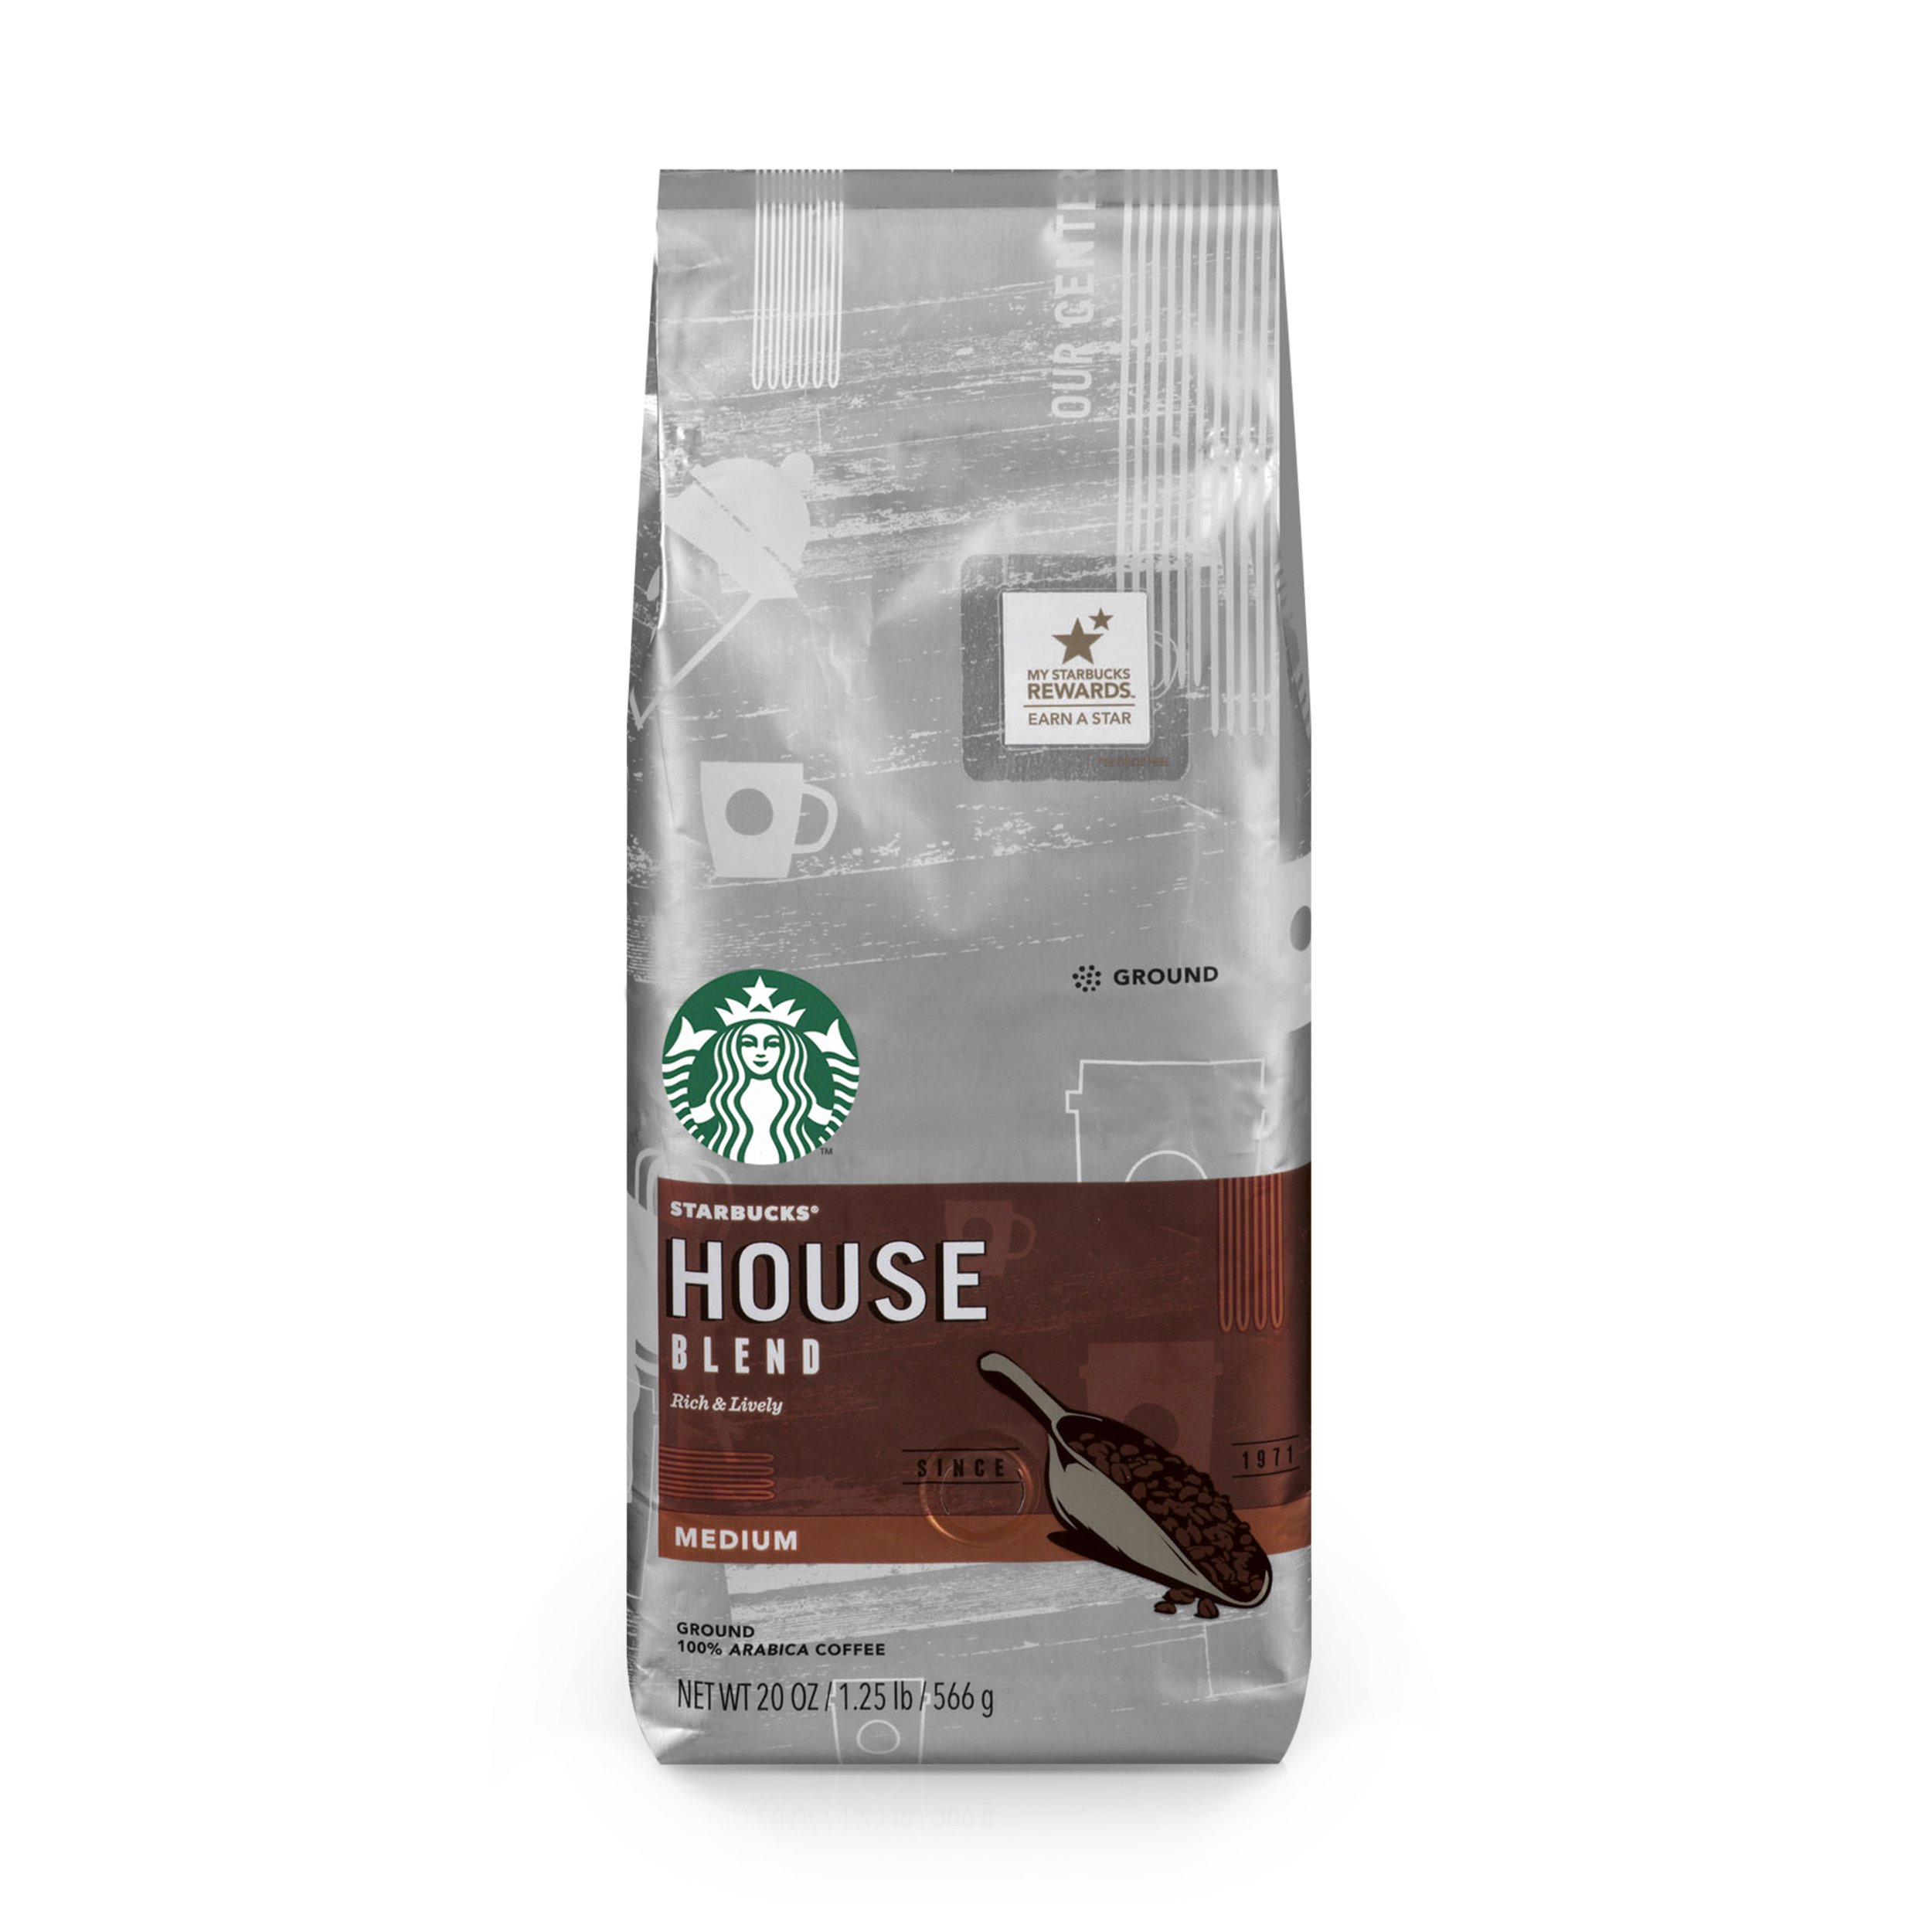 Starbucks House Blend Medium Roast Ground Coffee, 20-Ounce Bag